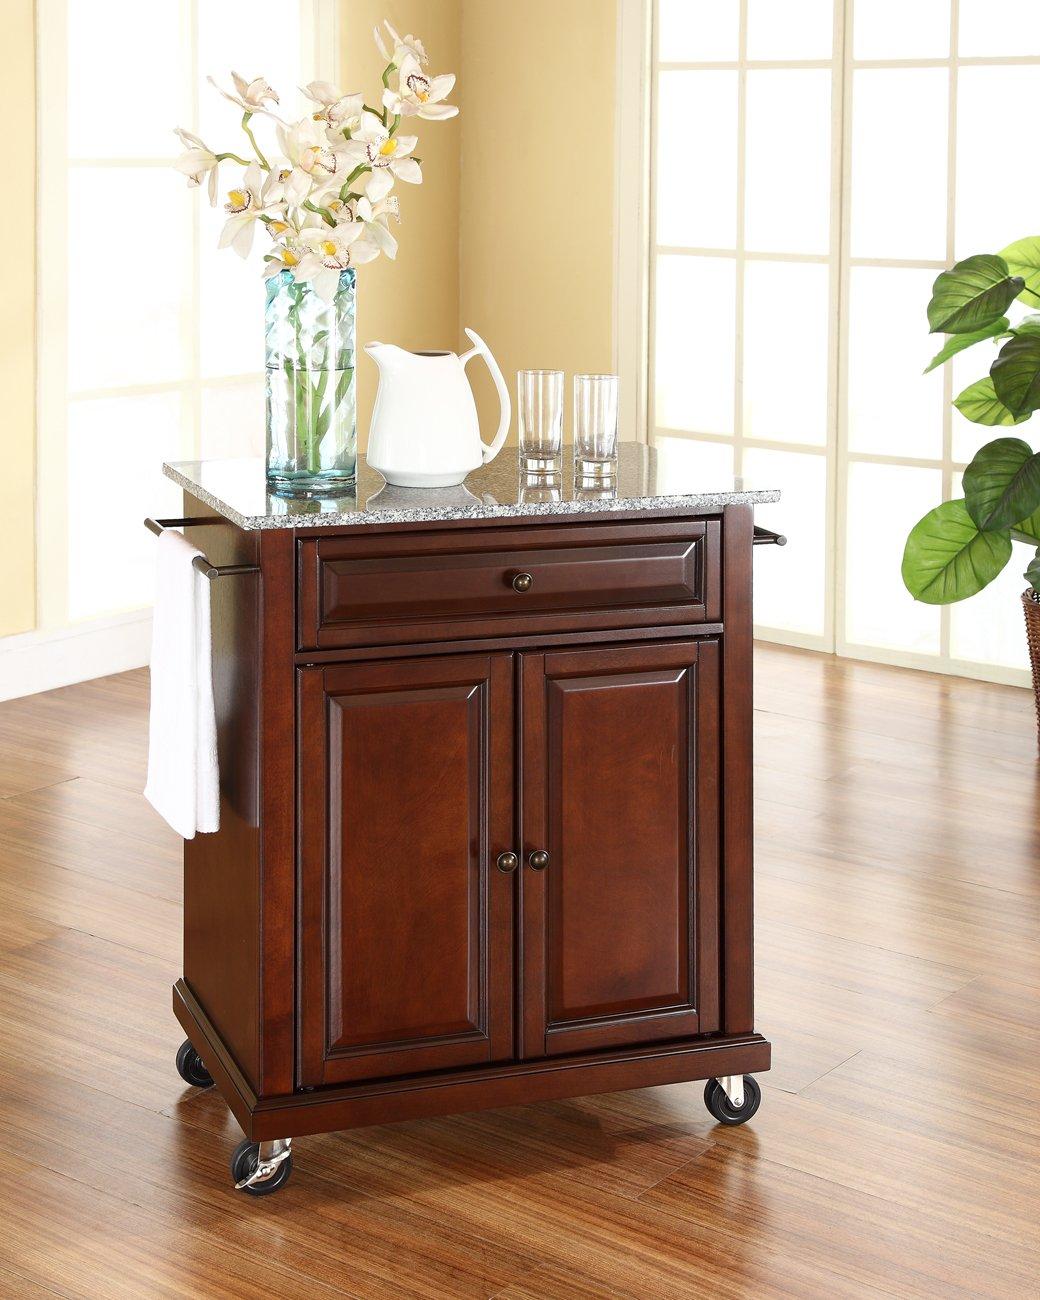 Crosley Furniture Cuisine Kitchen Island with Natural Wood Top - Black Crosley Furniture - DROPSHIP KF30021EBK